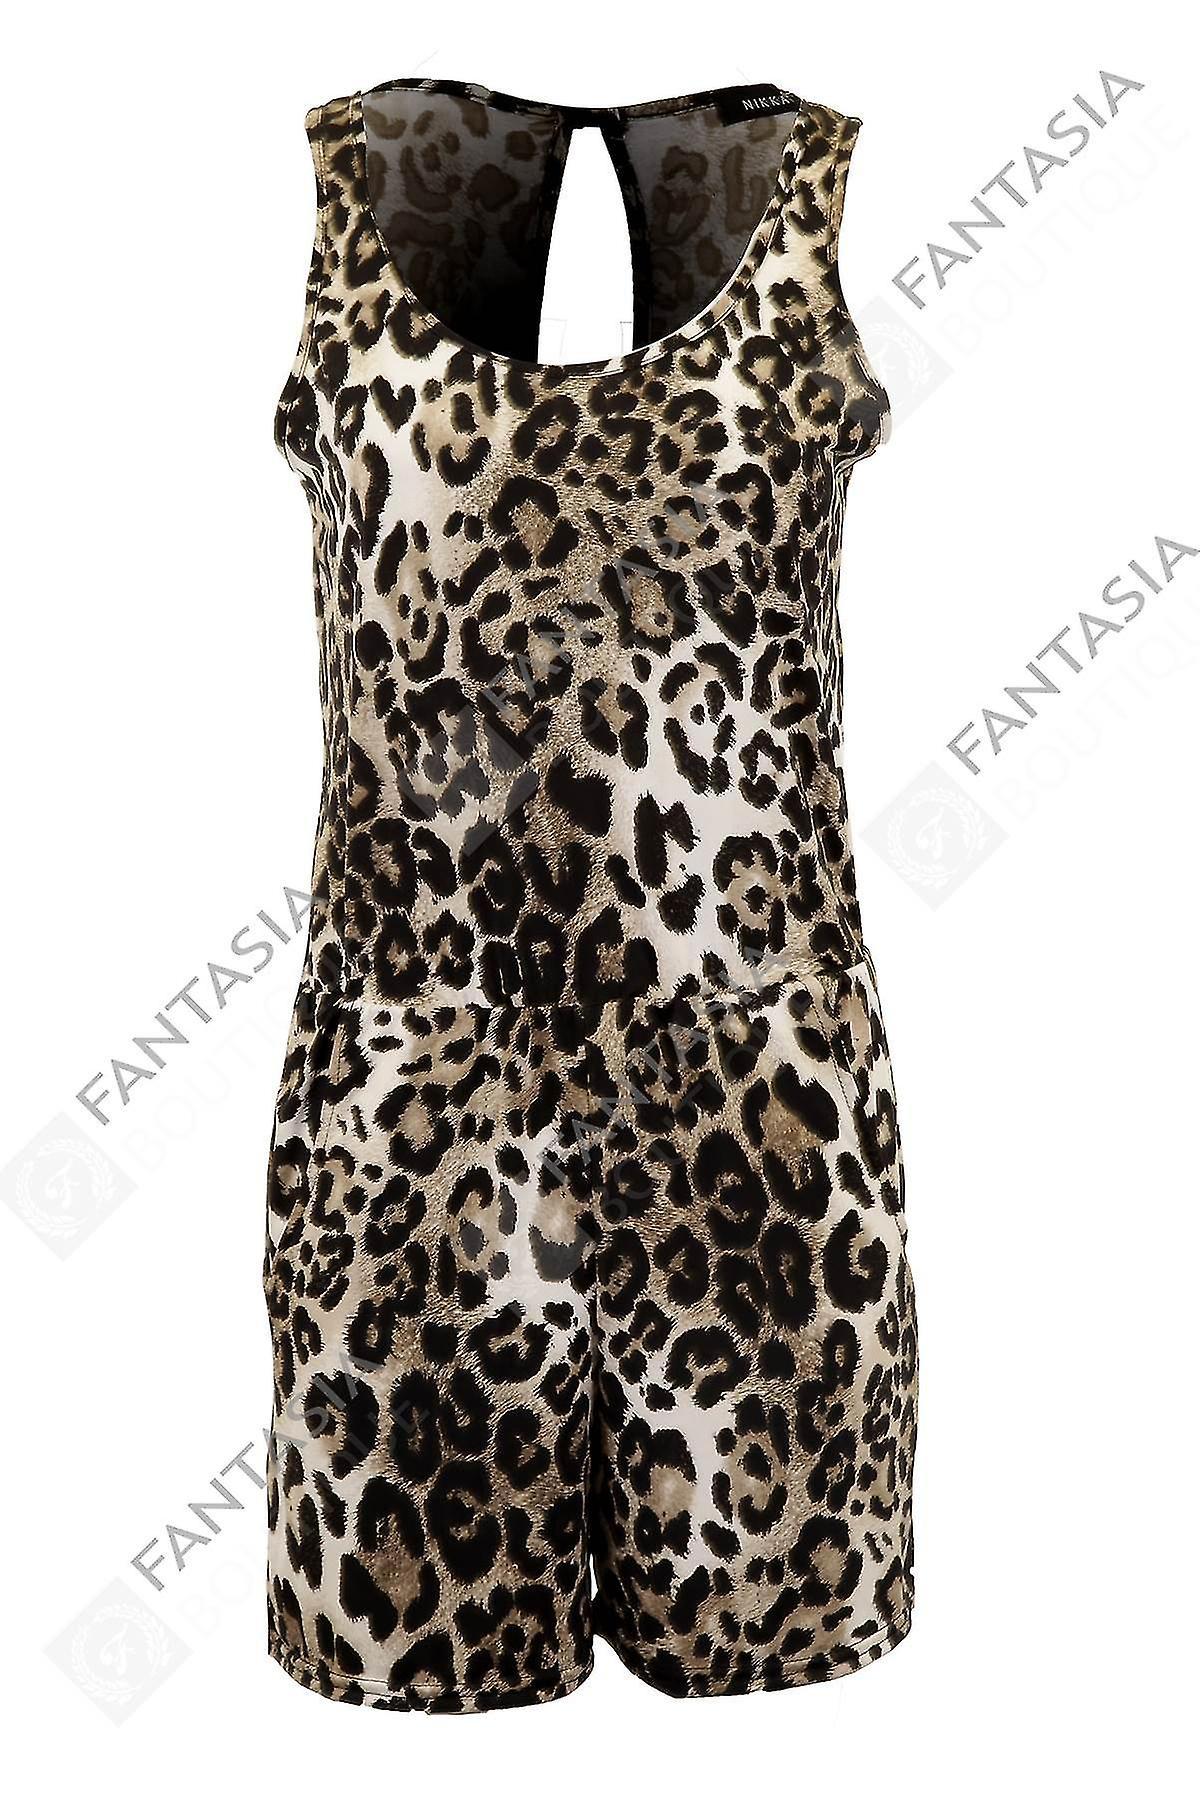 New Ladies Sleeveless Cut Out Back Leopard Print Elegant Women's Shorts Playsuit